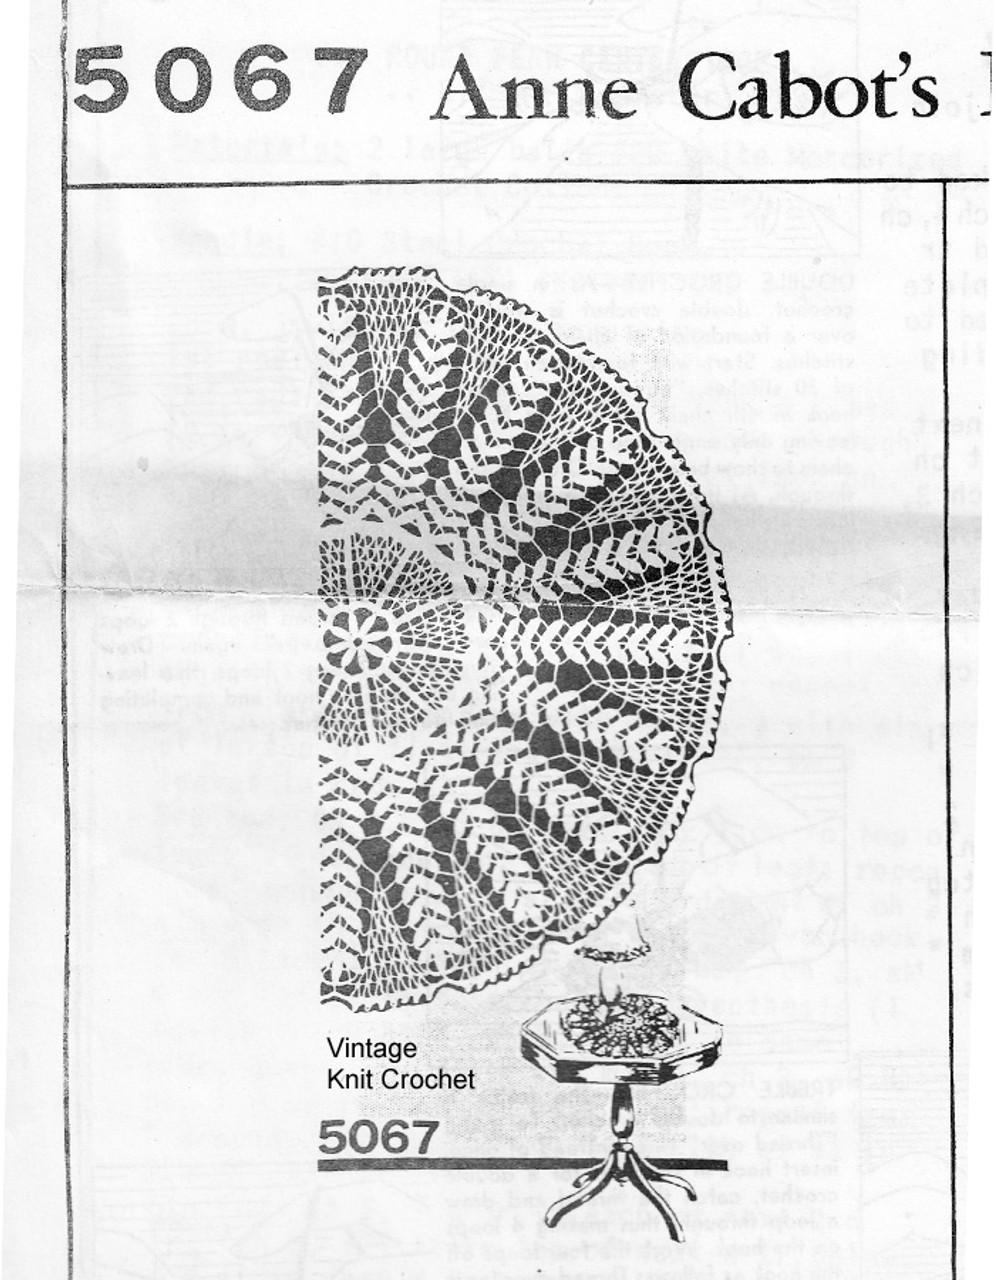 Crocheted Fern Centerpiece Doily Pattern, Mail Order 5067